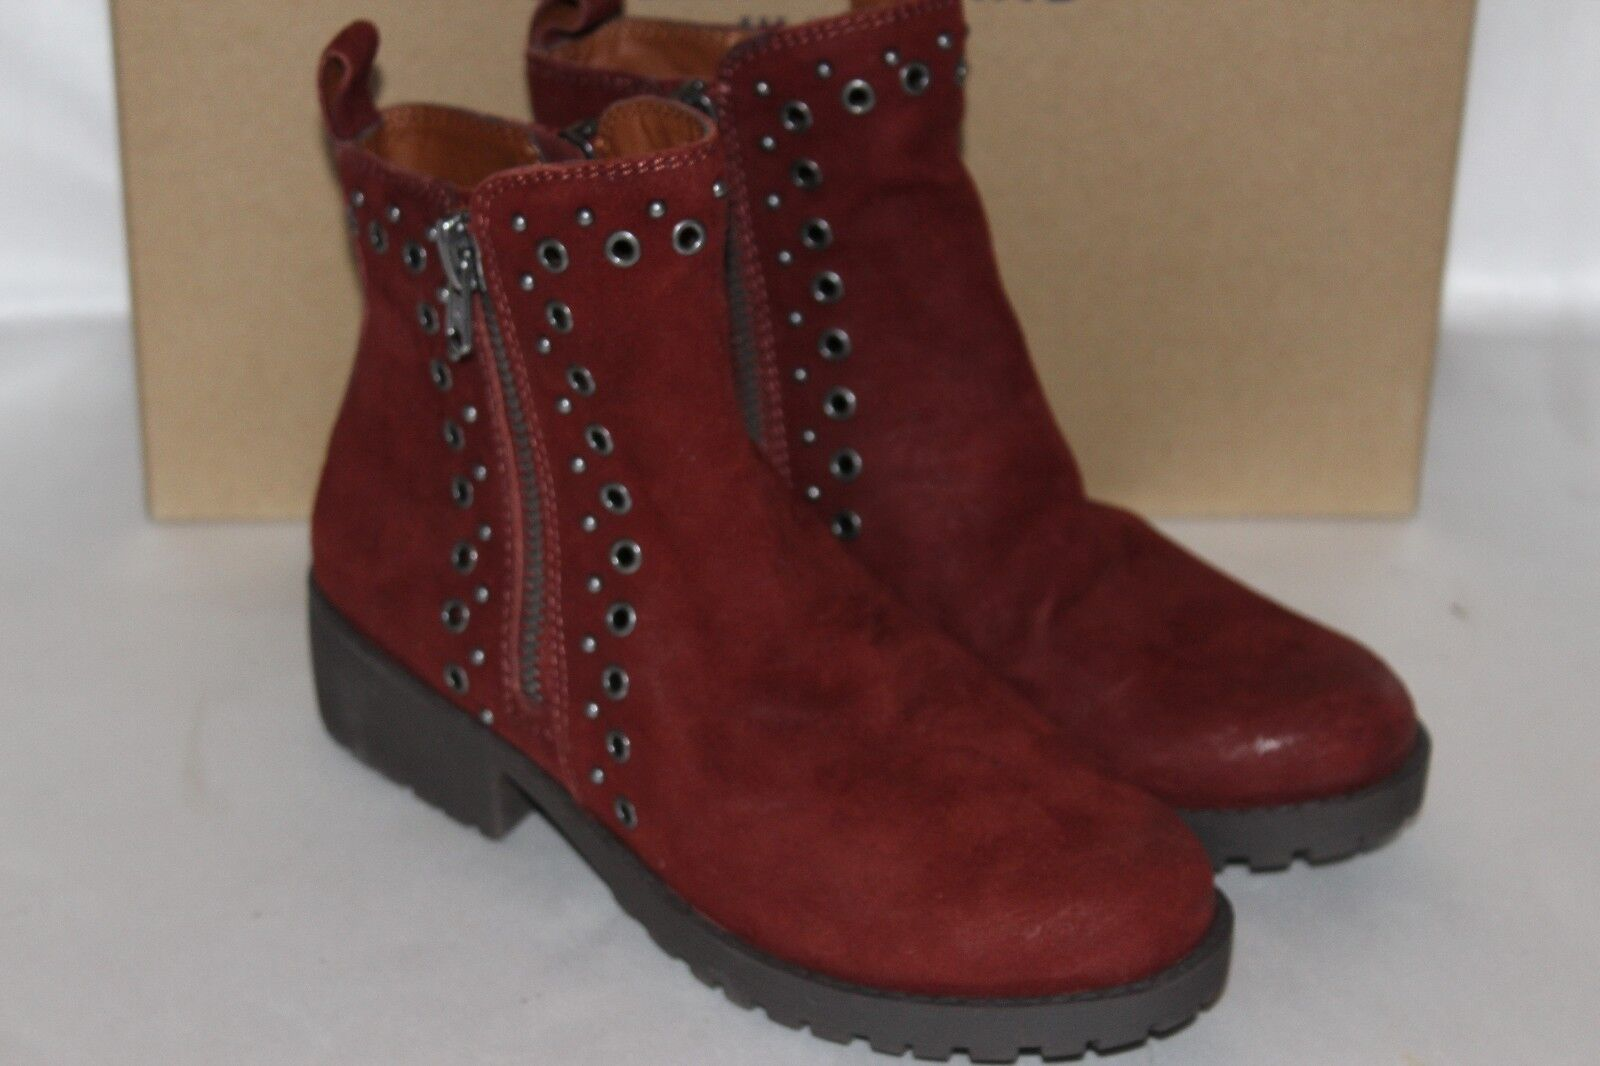 Nueva En Caja Cuero Gamuza Lucky Brand Borgoña Hannie Ojal Cremallera Tobillo botas